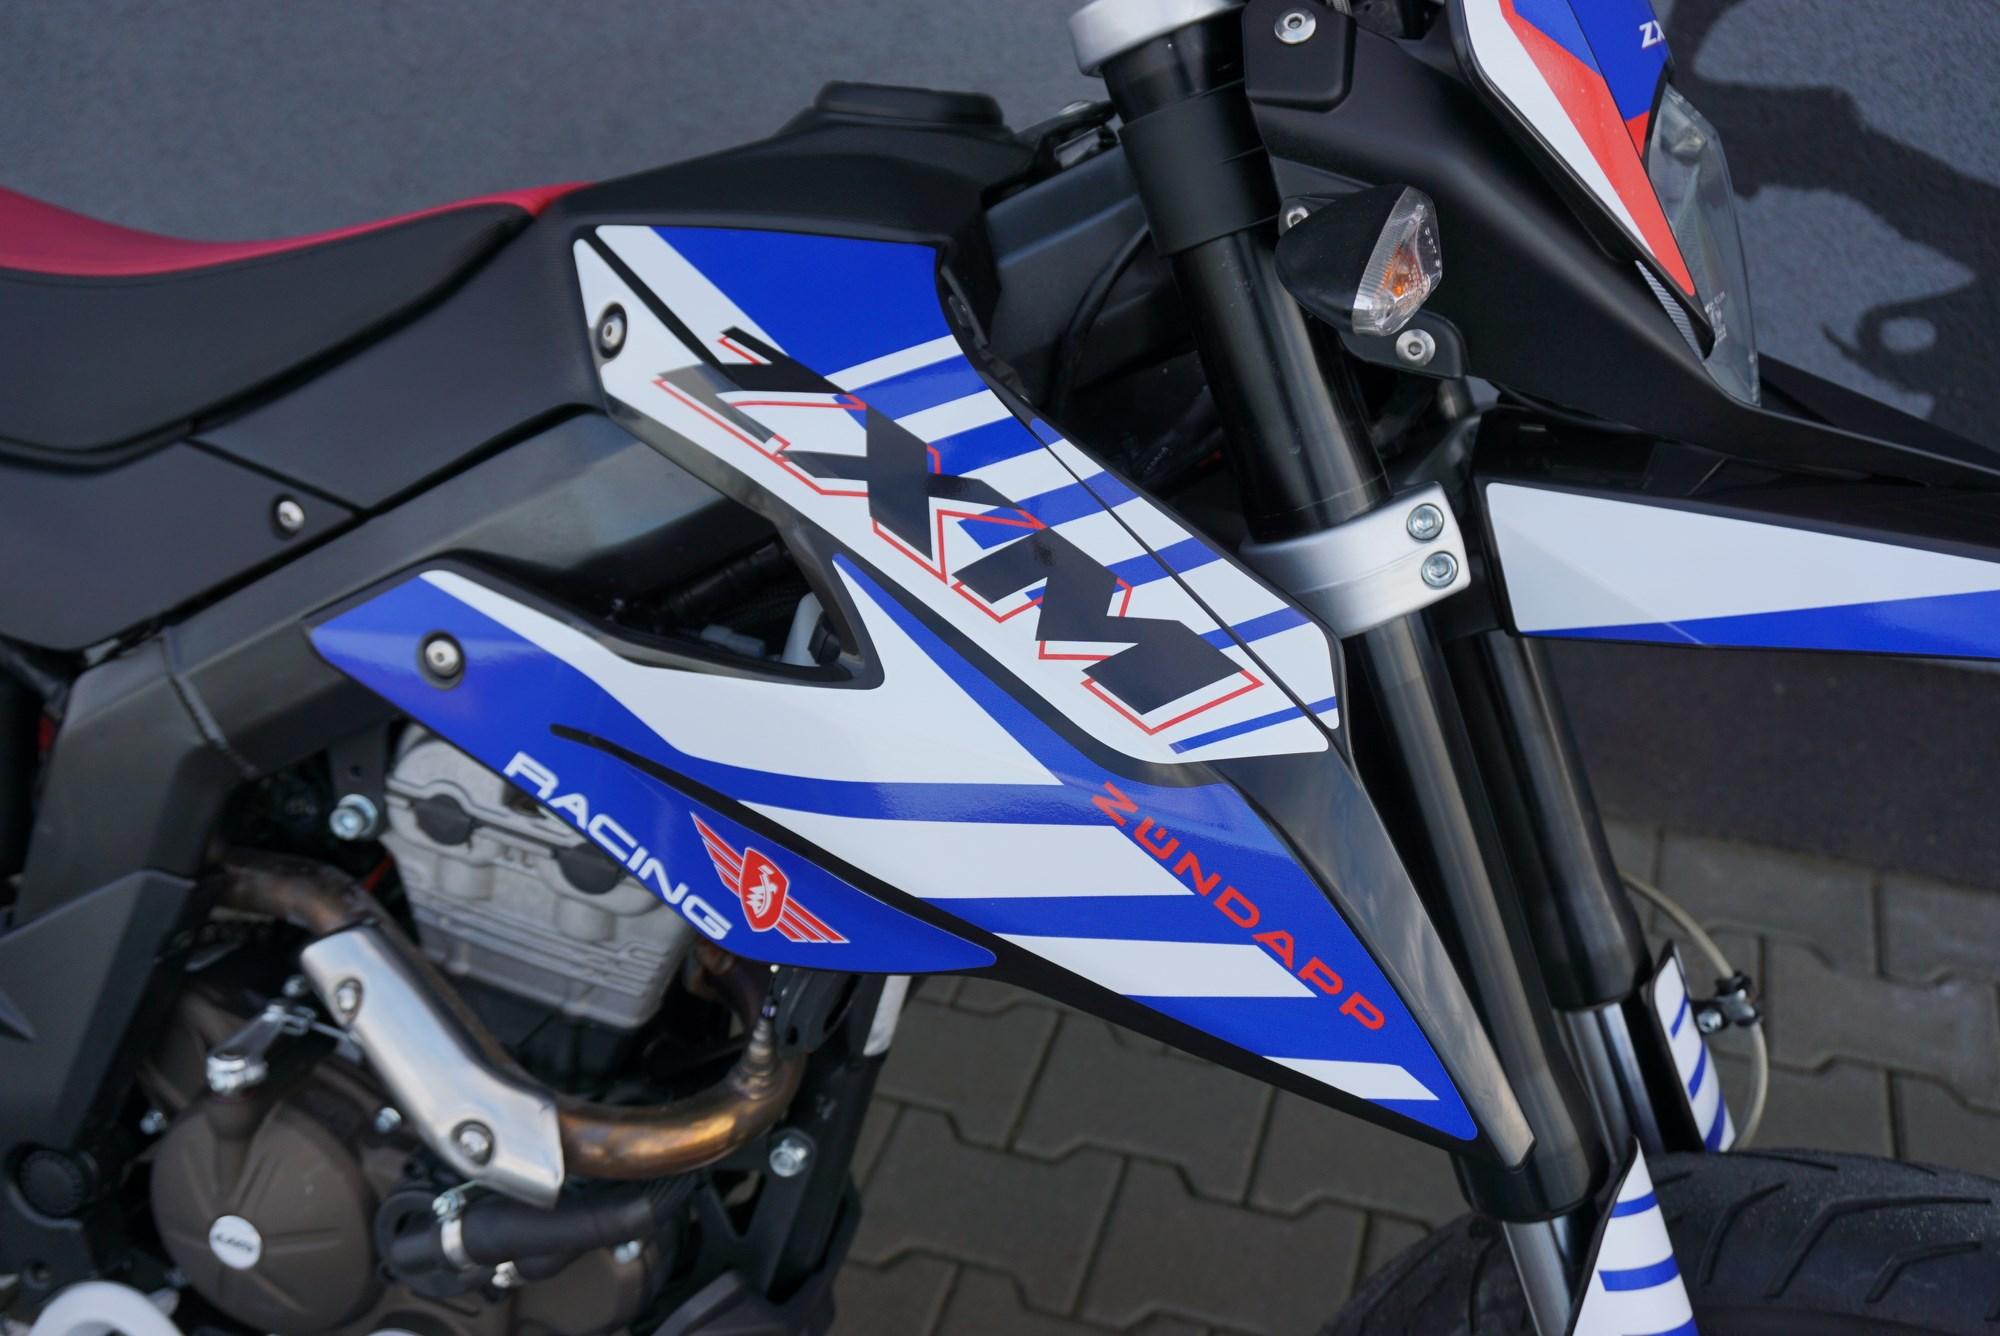 Zundapp ZXM 125 / Aprilia SX 125